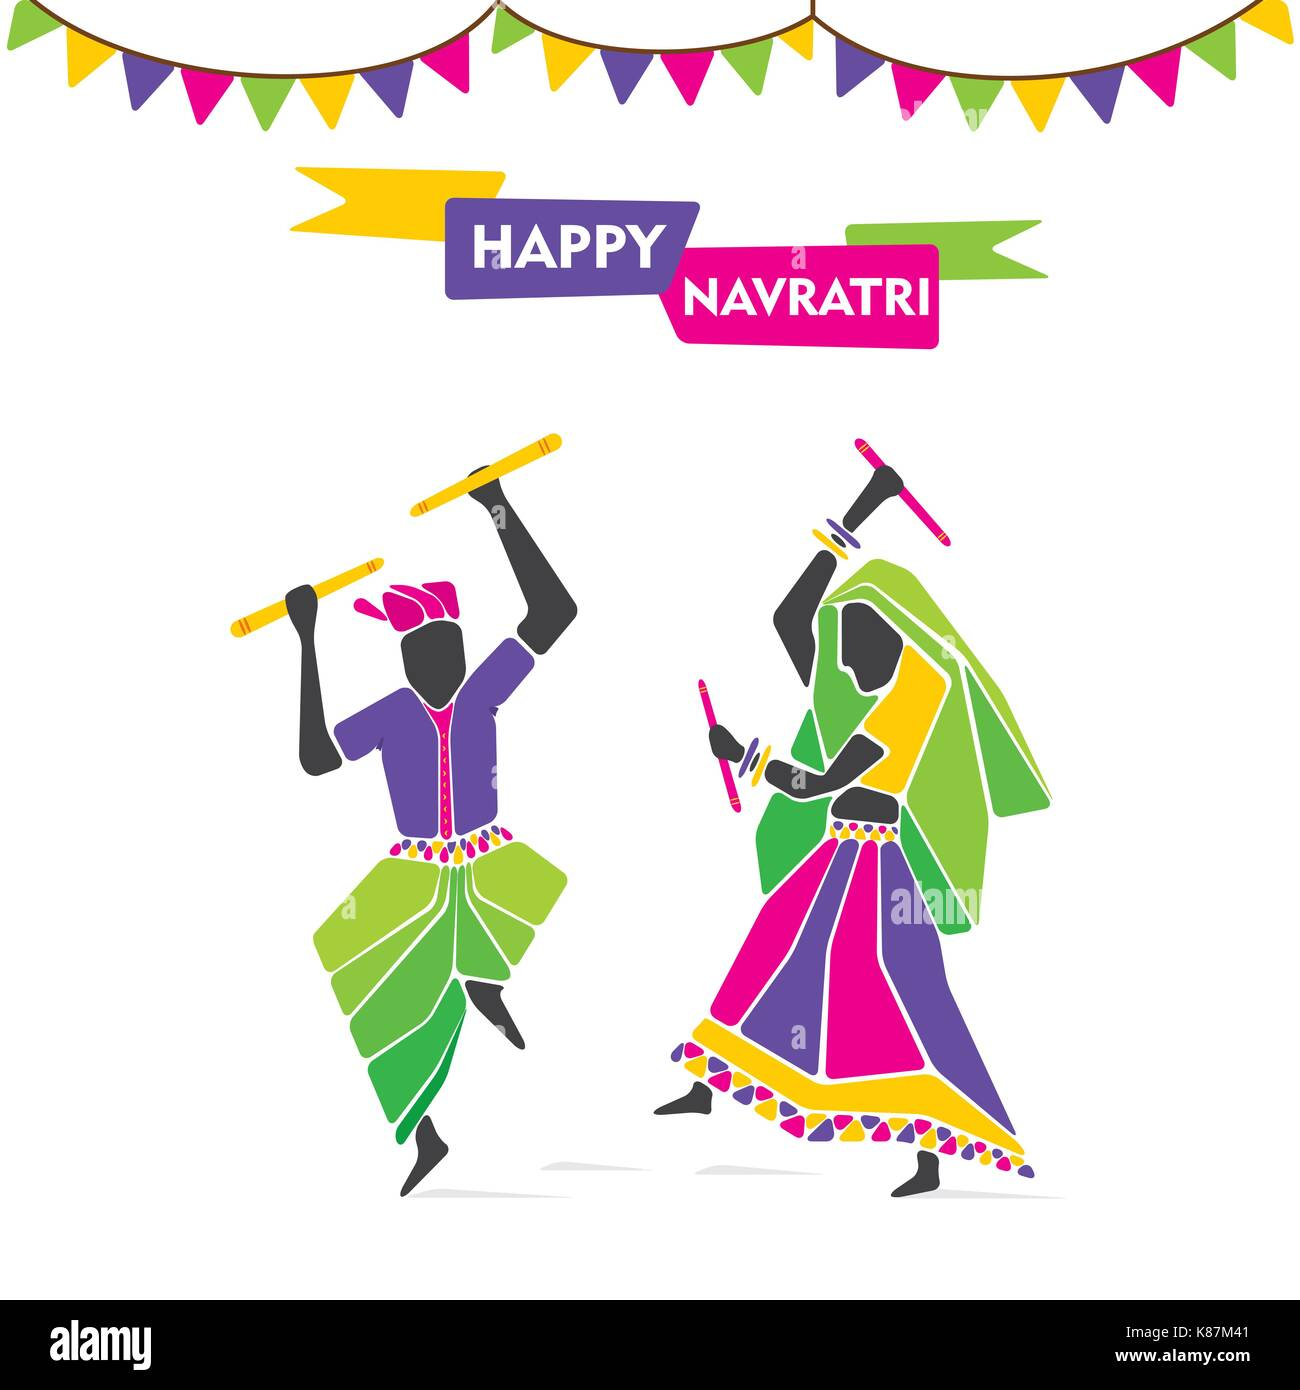 happy navratri playing dandiya dance poster design stock